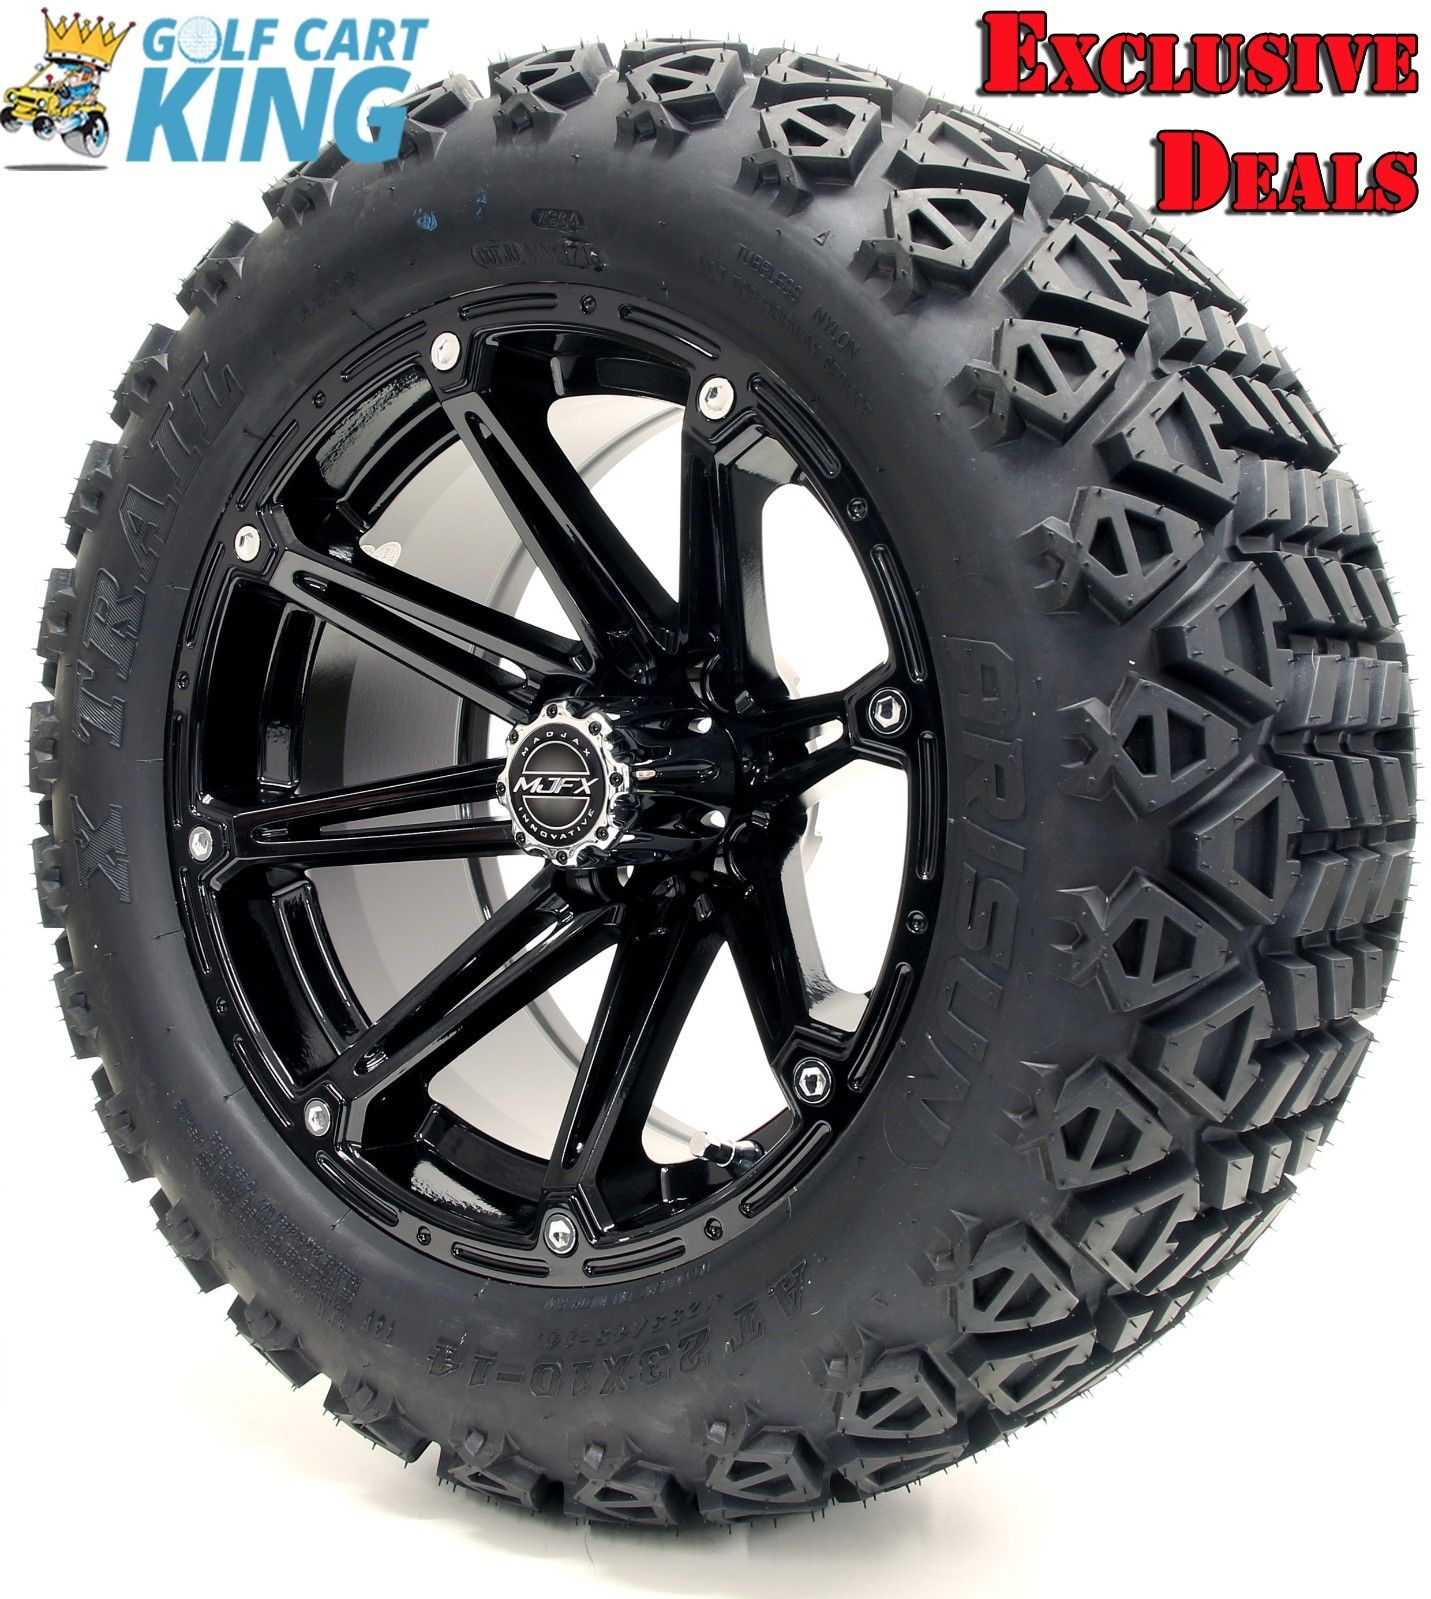 Golf Cart Wheels And Tires Combo 14 Madjax Element Black Set Of 4 Ebay